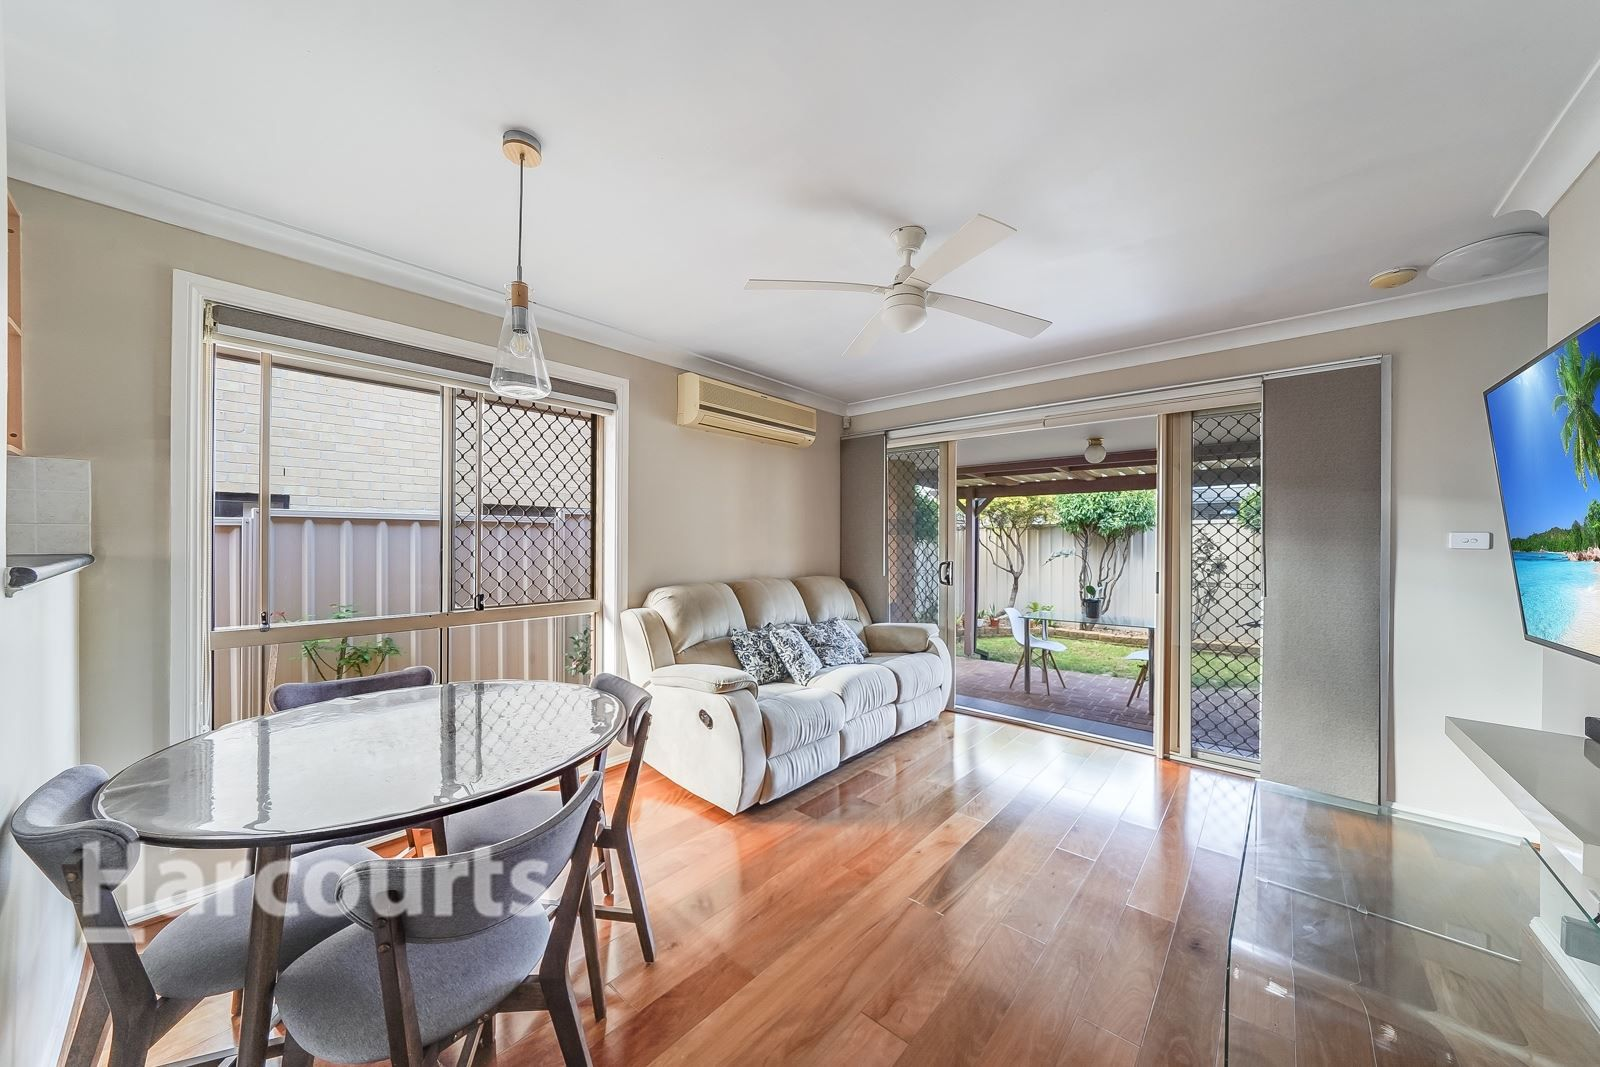 3/34 Allman Street, Campbelltown NSW 2560, Image 2